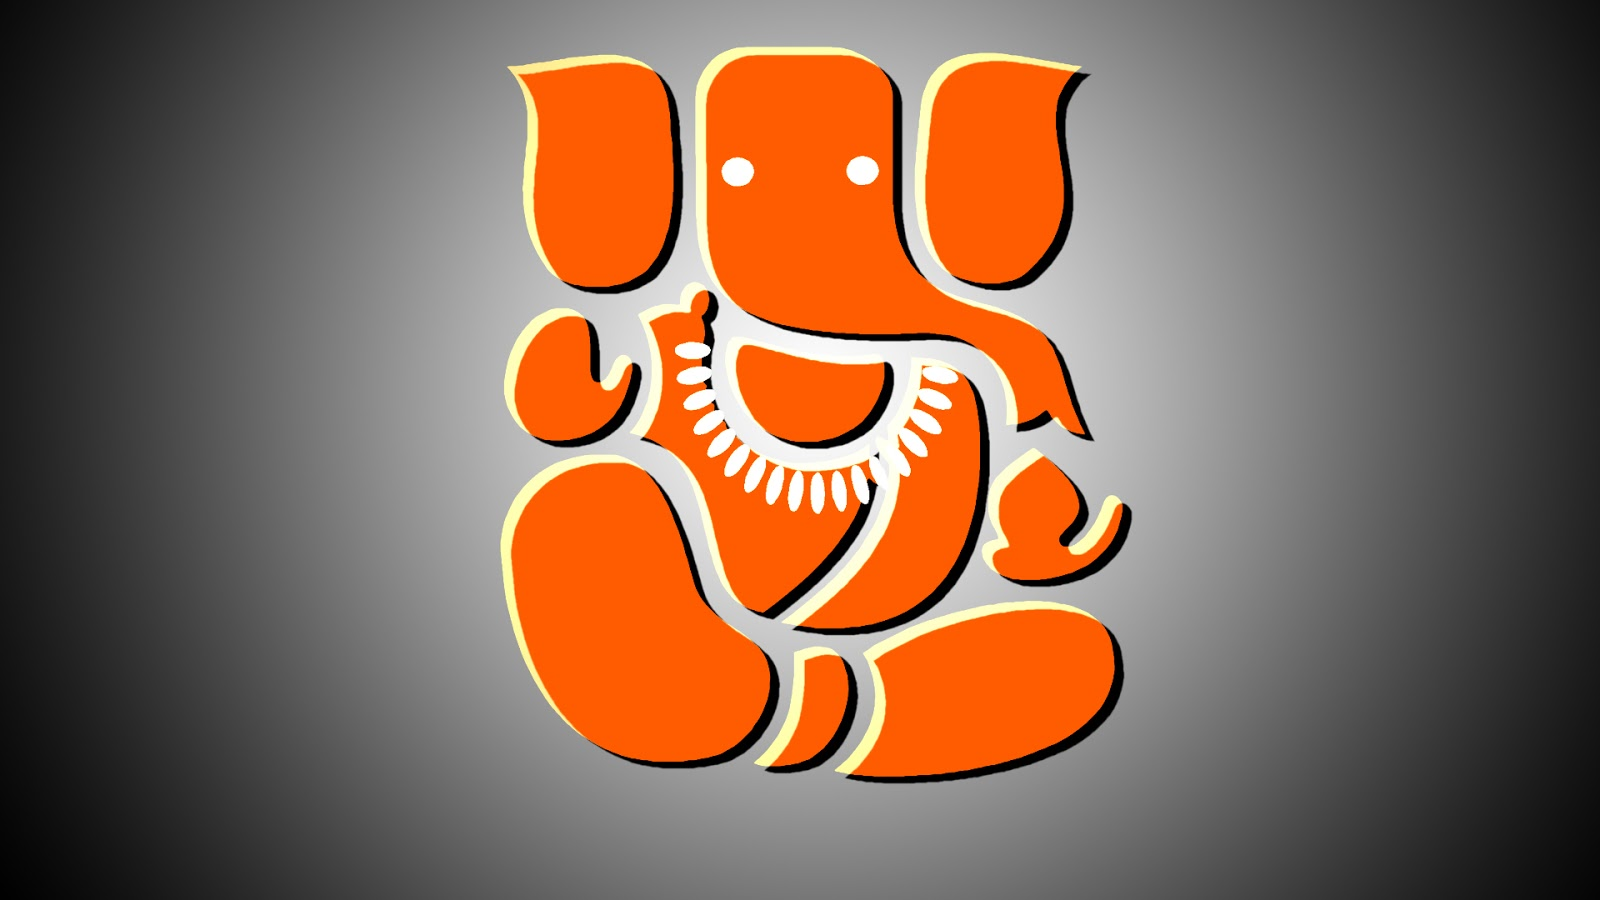 Hd wallpaper vinayagar - Here Is The Collection Of Beautiful 3d Photos Of The God Of Good Sign Lord Ganesha Vinayagar Pillayar S Photos Images Animated Painting And Hd Wallpapers